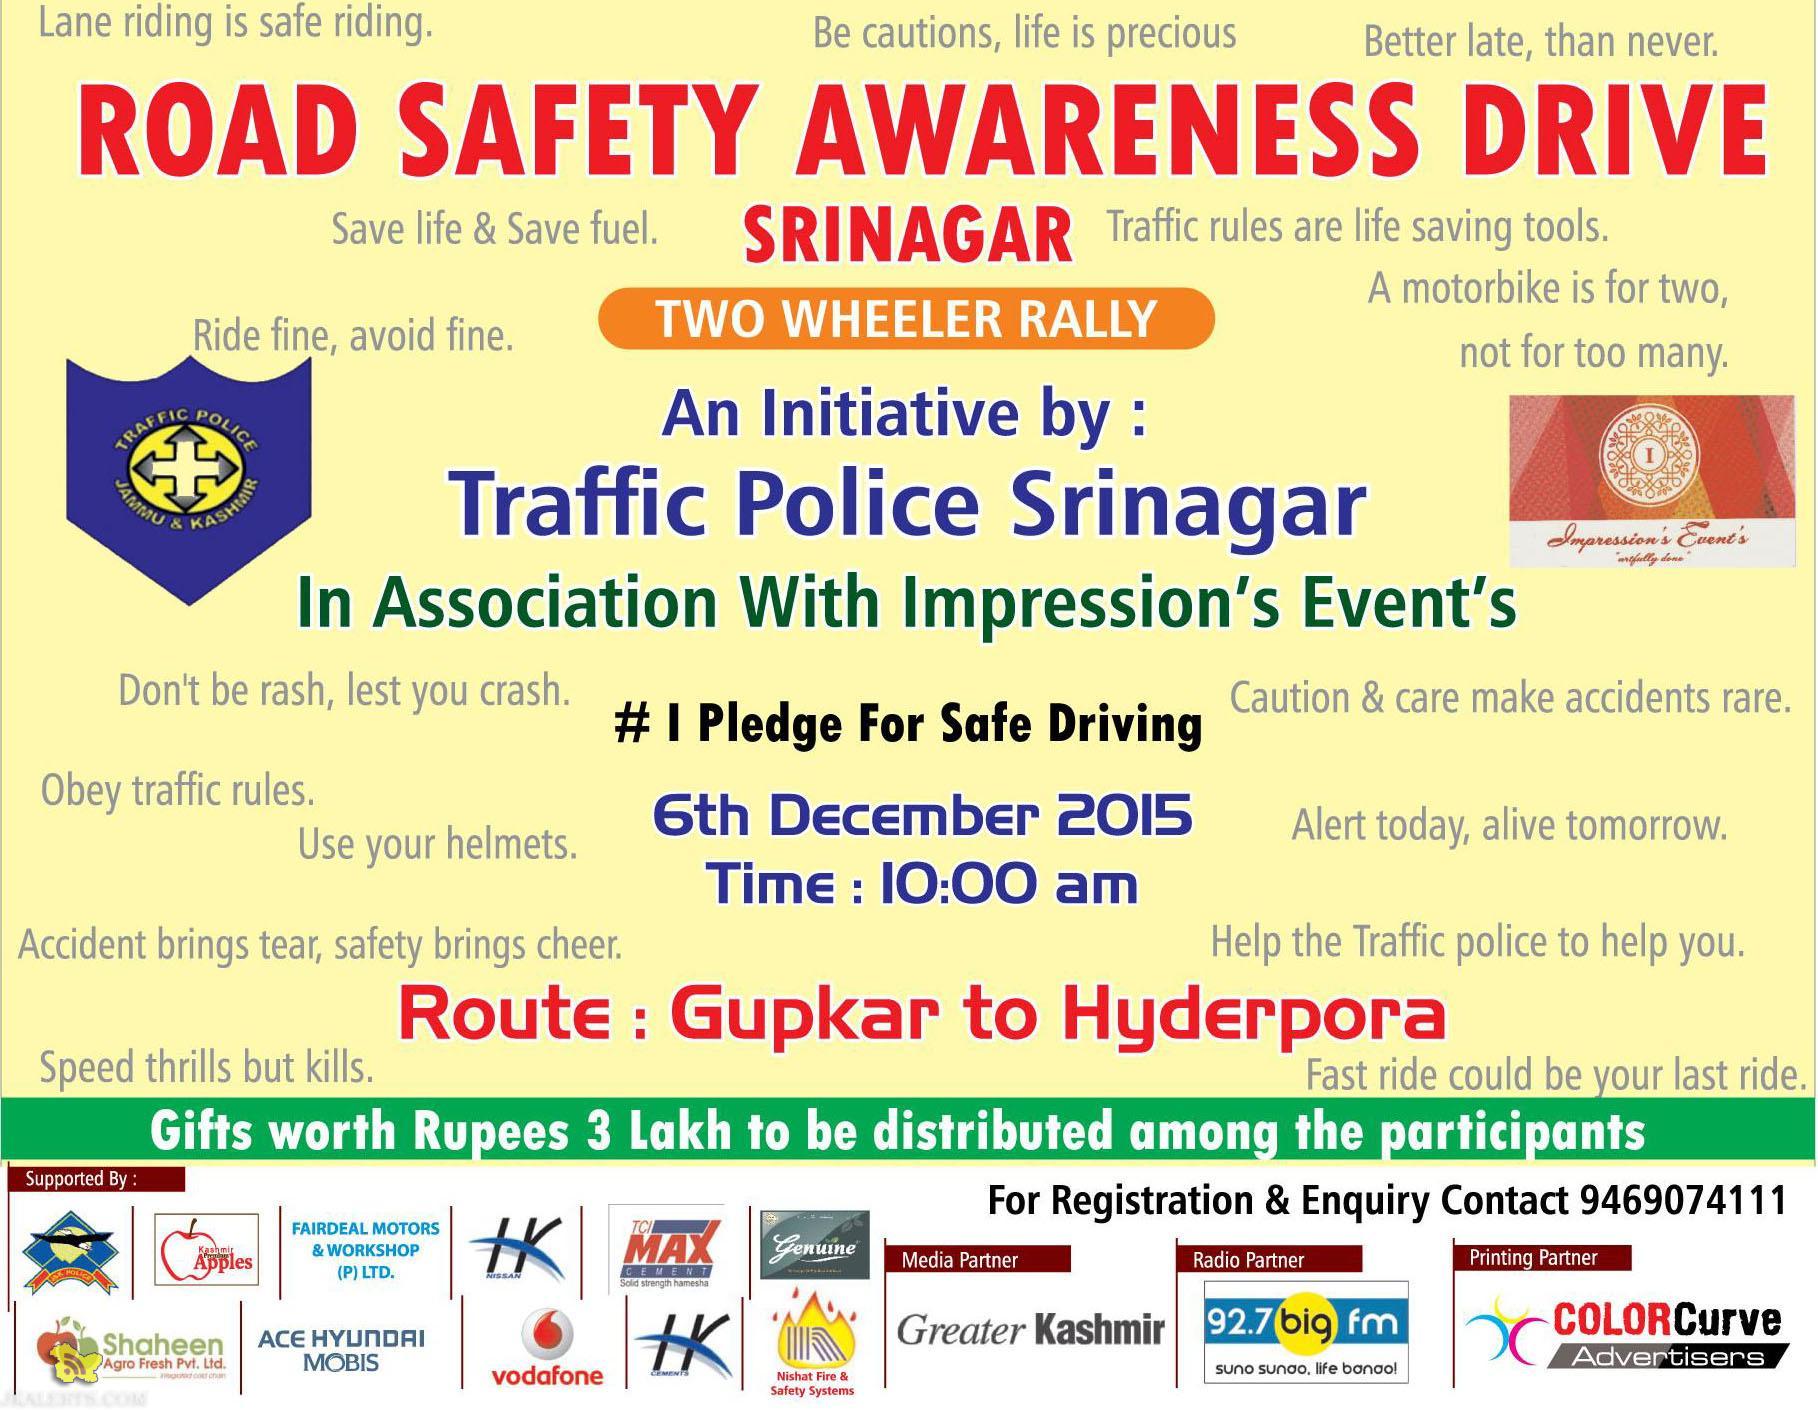 ROAD SAFETY AWARENESS DRIVE SRINAGAR, Traffic Police Srinagar